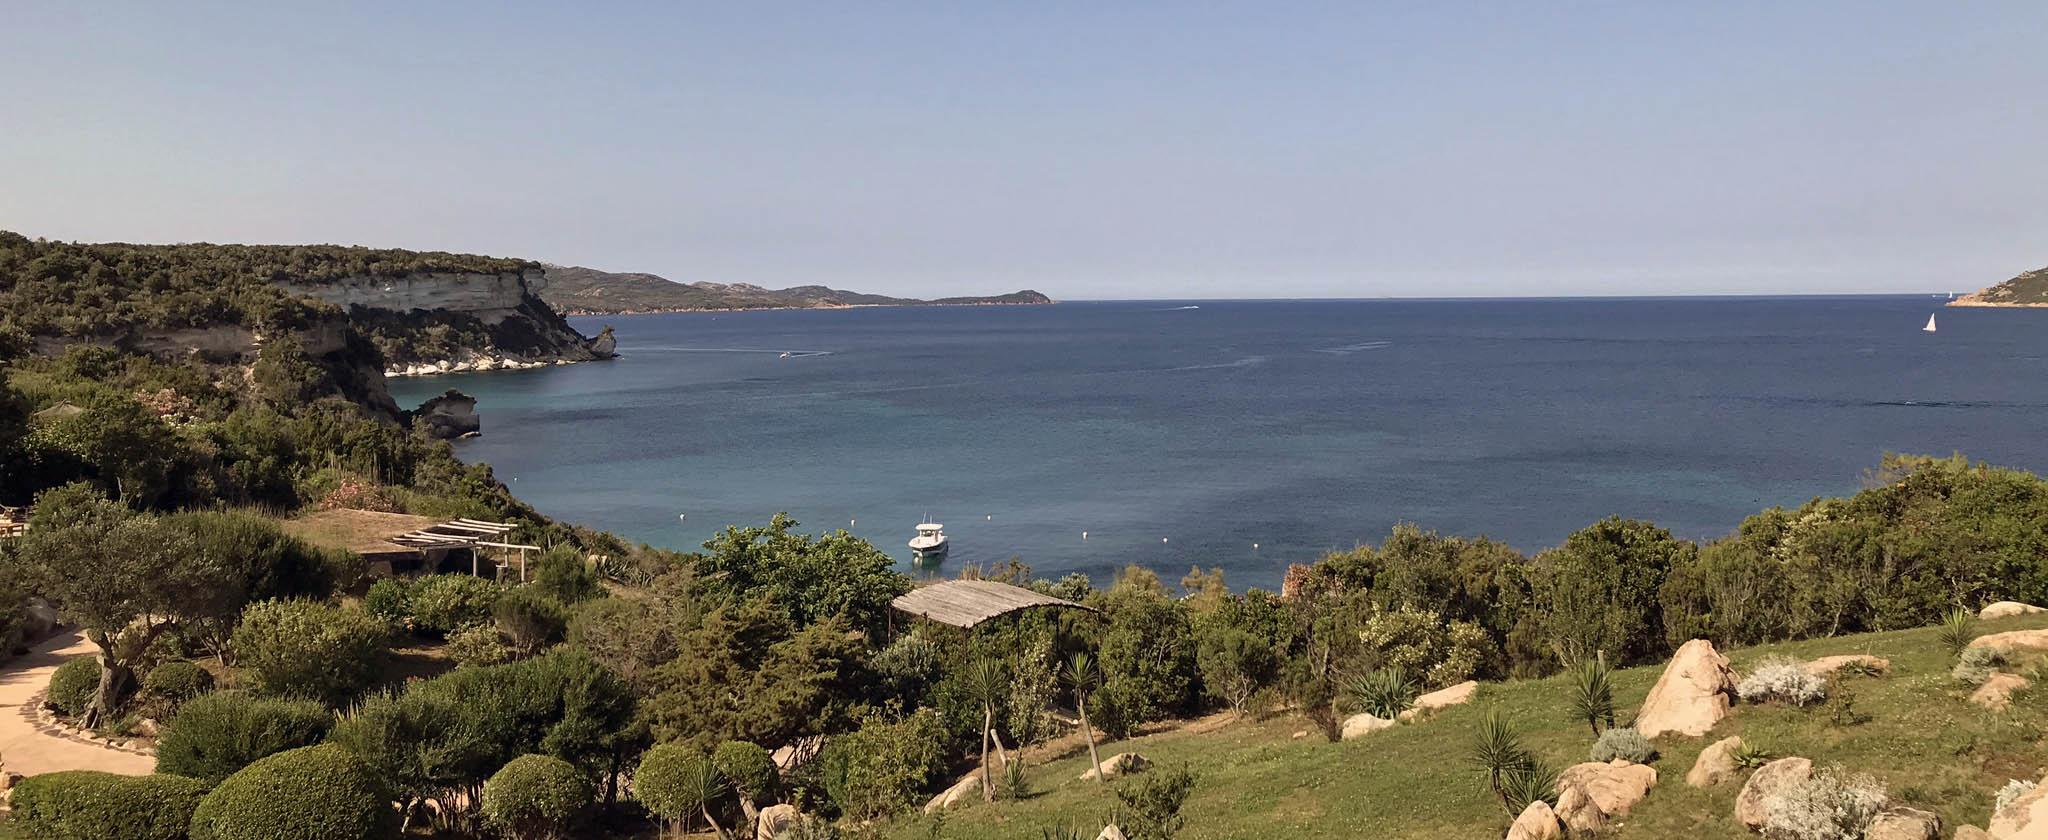 Hotel Capu Biancu Golfe de Sant'Amanza Bonifacio photo Thibaud Assante DR